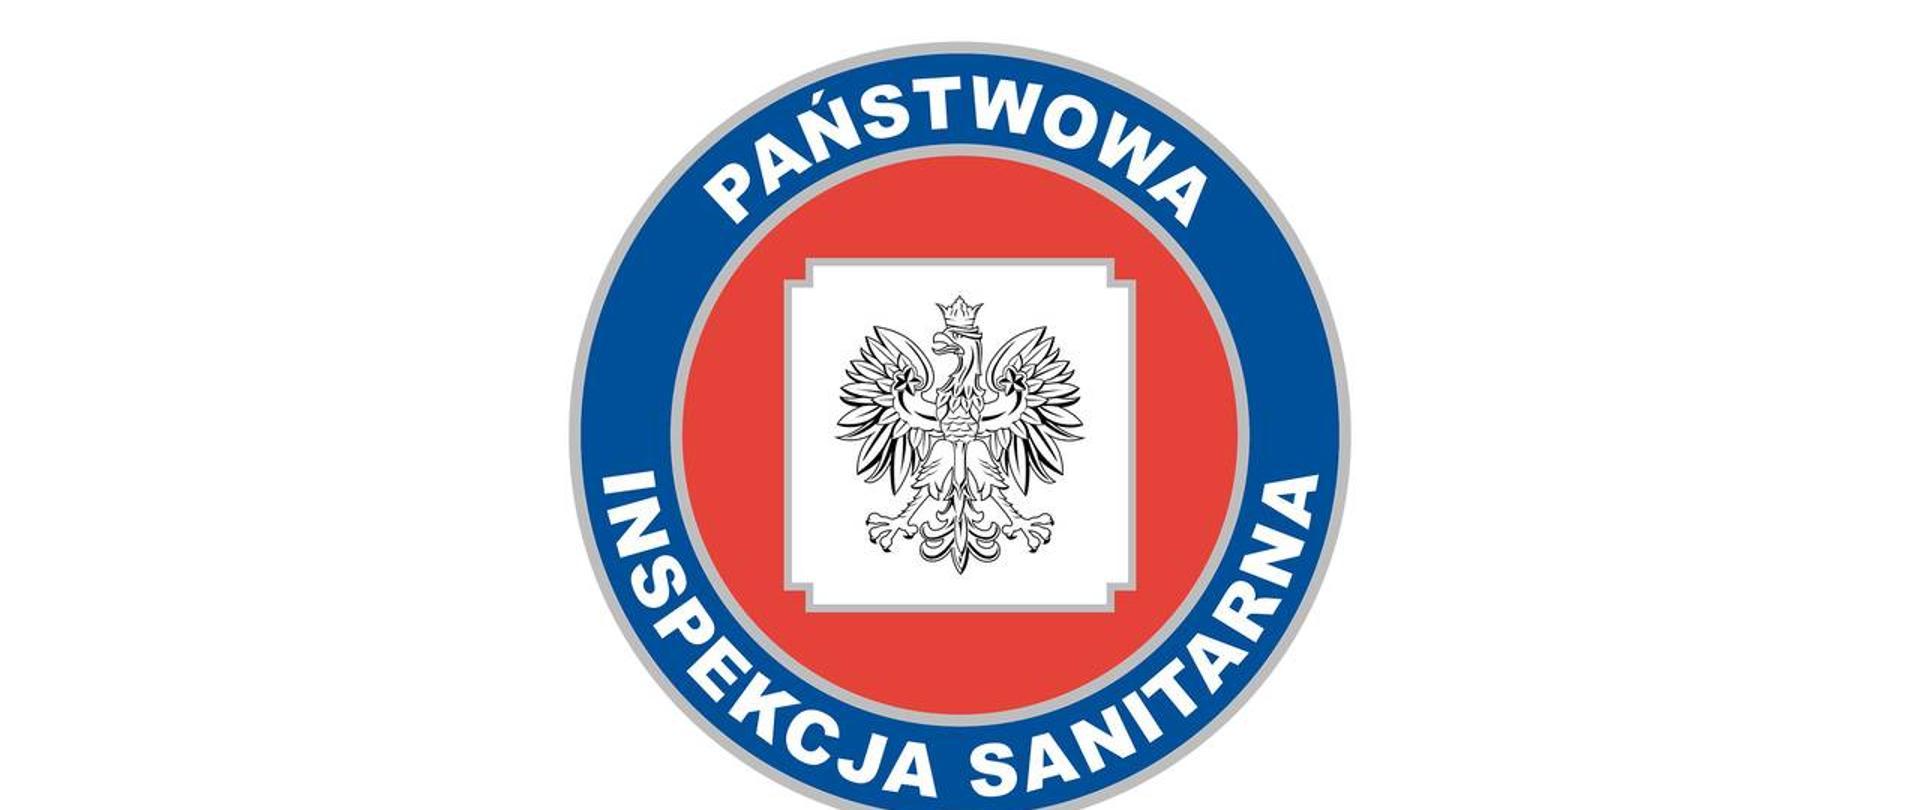 Komunikat Państwowej Inspekcji Sanitarnej - Polska w Rosji ...